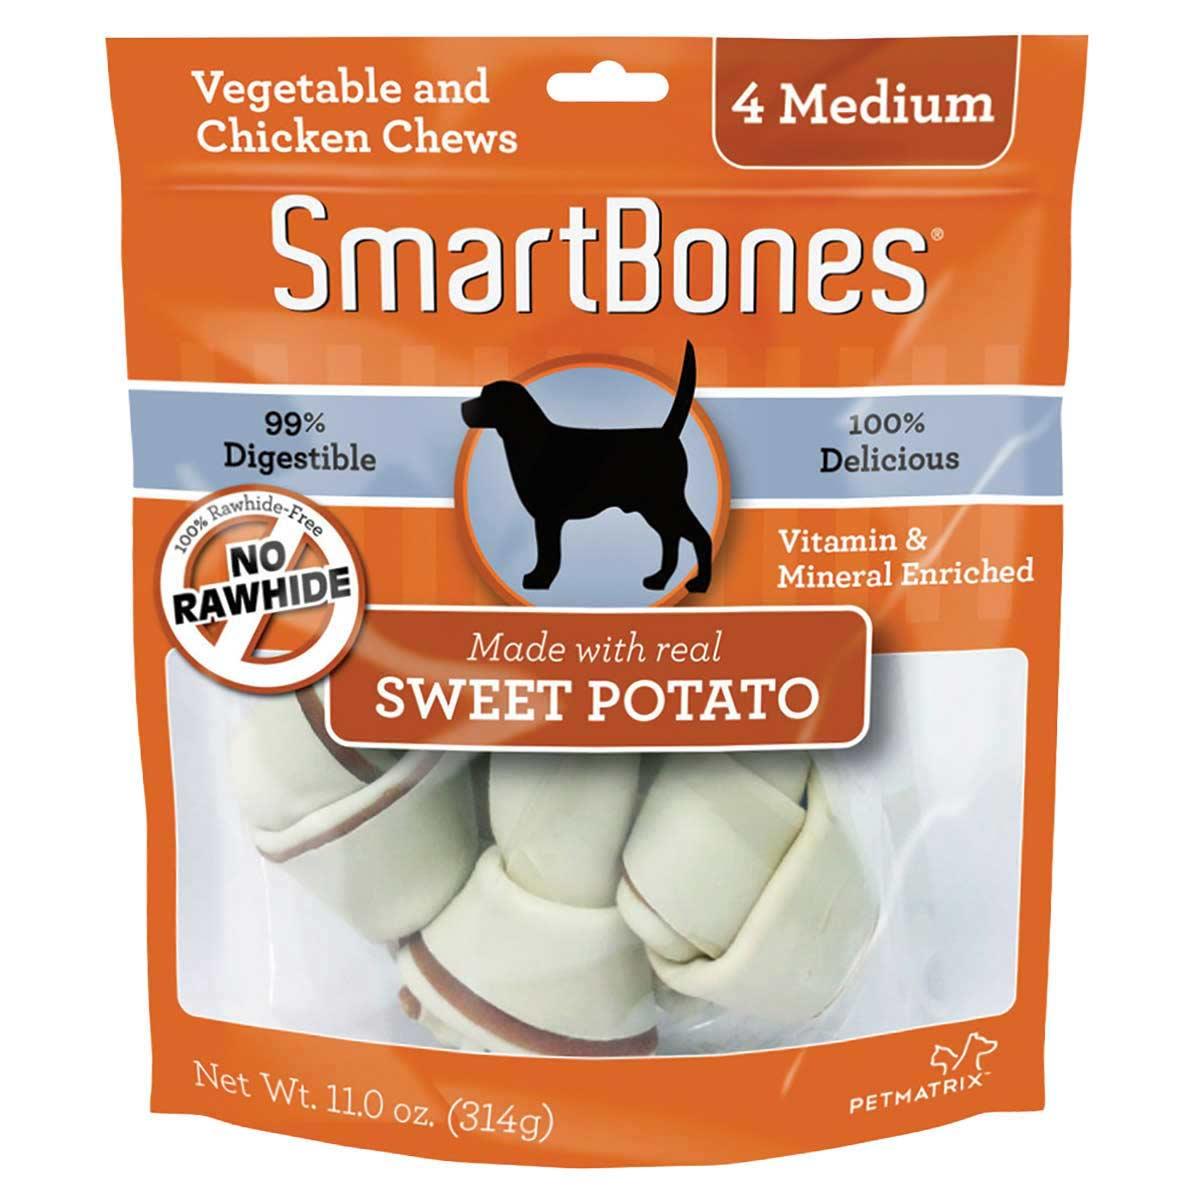 SmartBones Sweet Potato Bone 5.5 inch Medium 4 Pack - Alternative to Rawhide